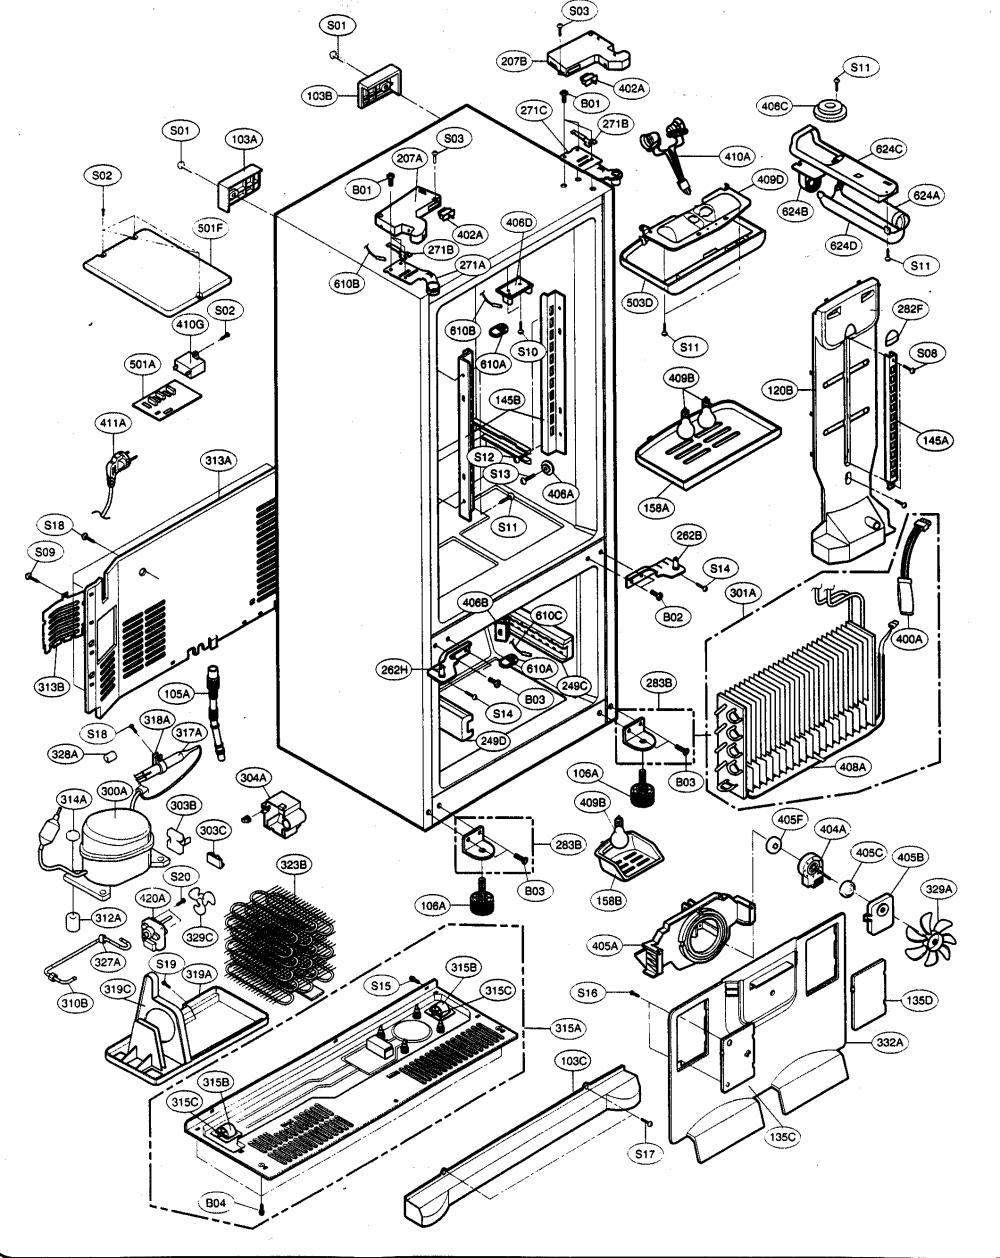 medium resolution of kenmore refrigerator parts diagram schema wiring diagram kenmore fridge schematic kenmore fridge schematic